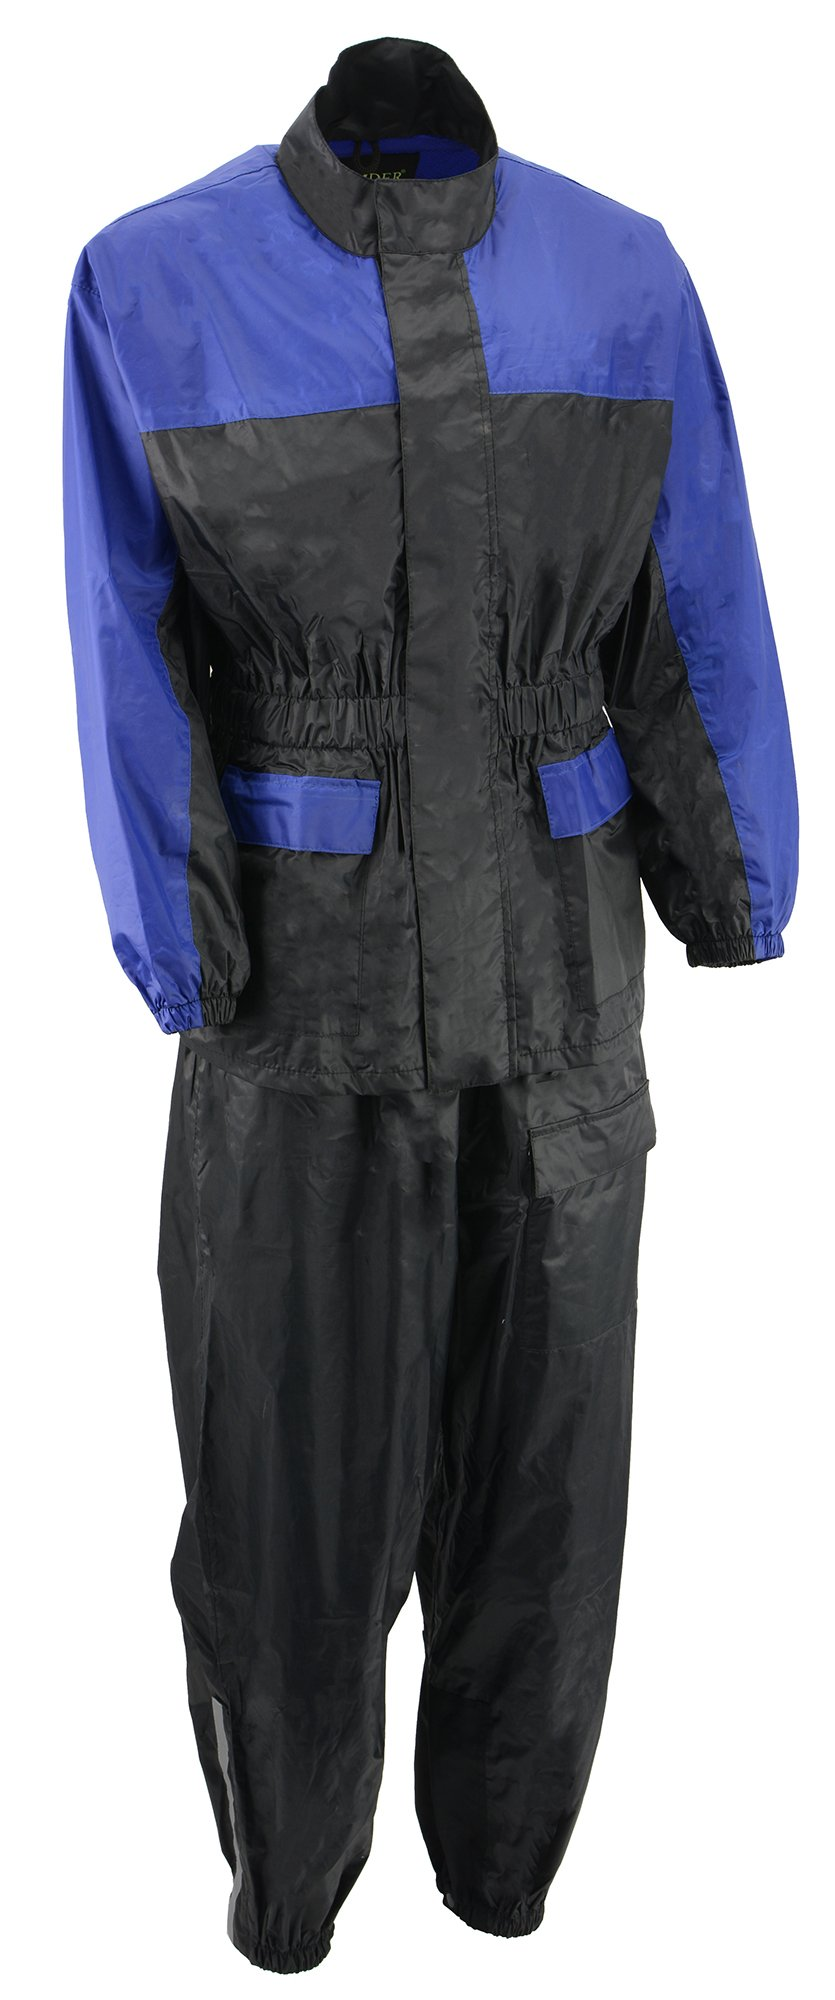 M-BOSS MOTORCYCLE APPAREL-BOS19500-BLK/BLU-Men's two piece motorcycle rain gear.-BLK/BLU-MEDIUM